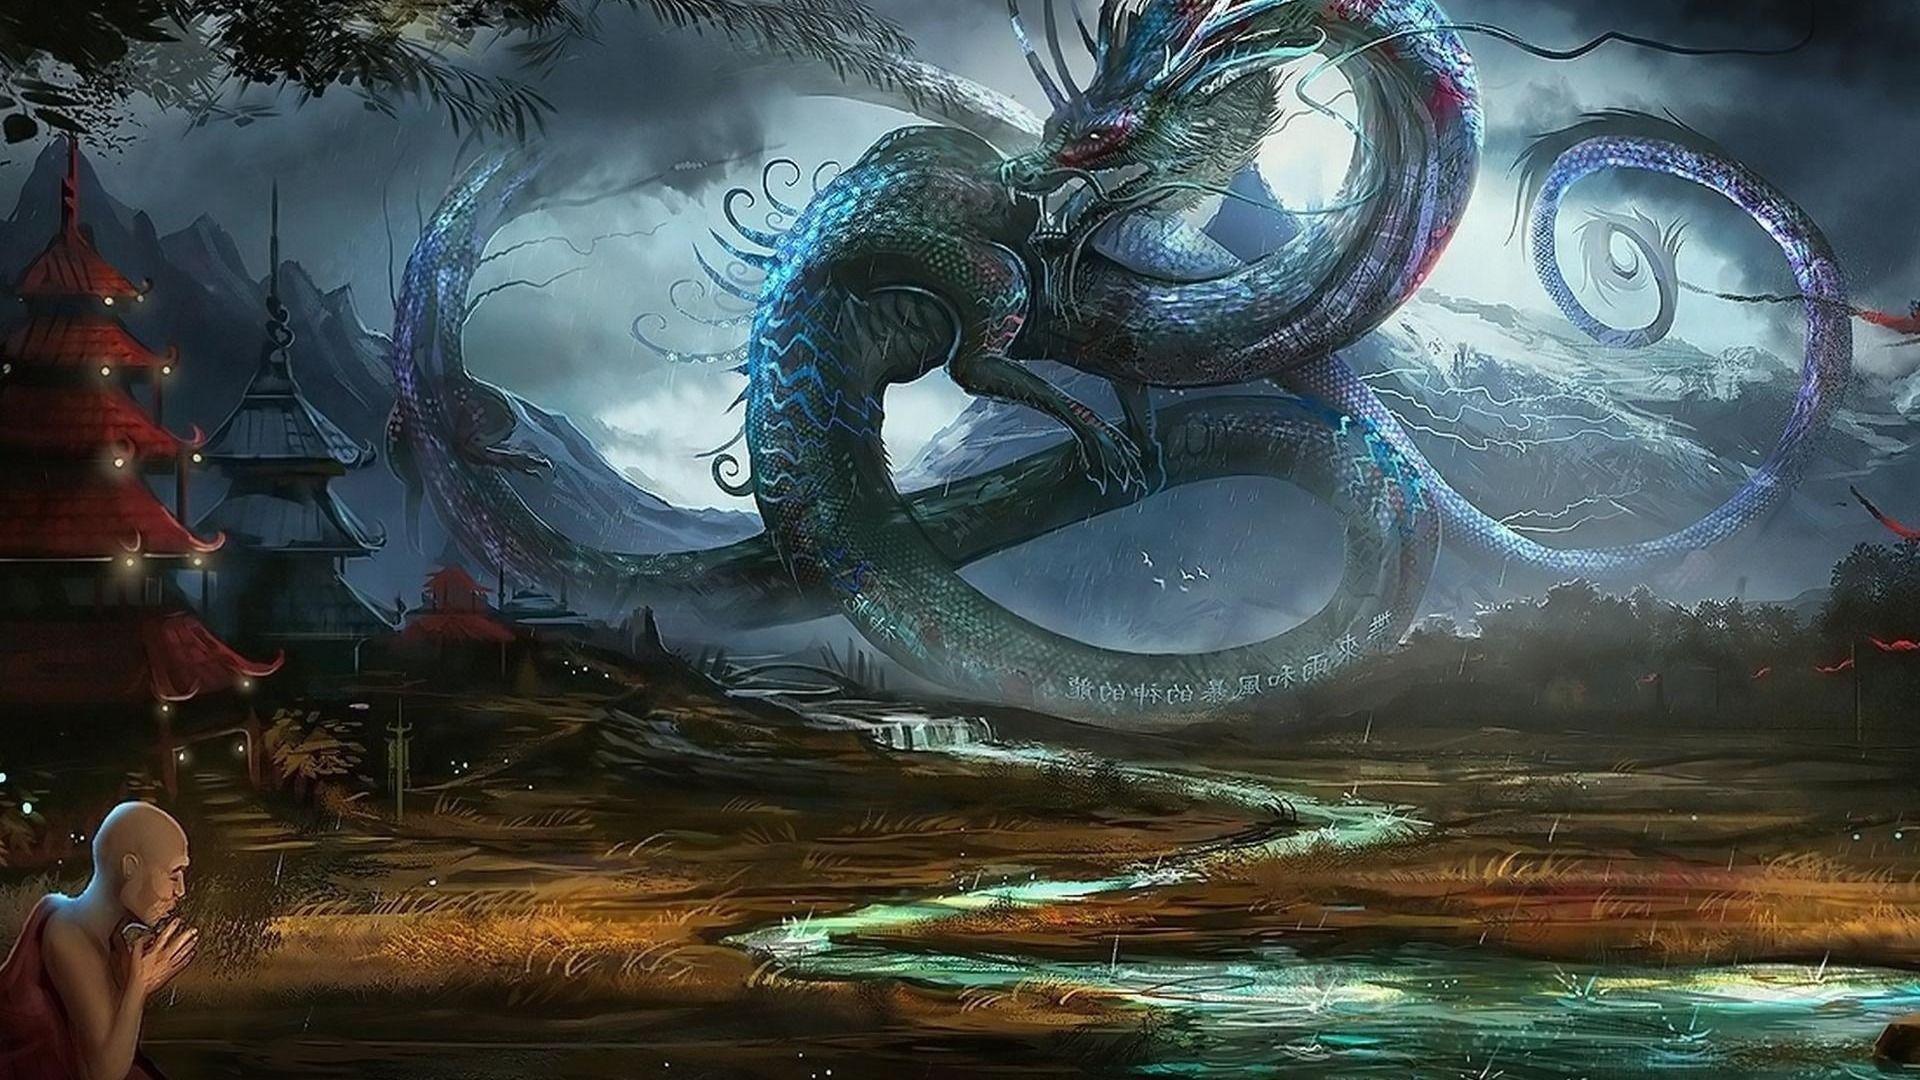 awesome 3d dragon wallpaper - photo #39